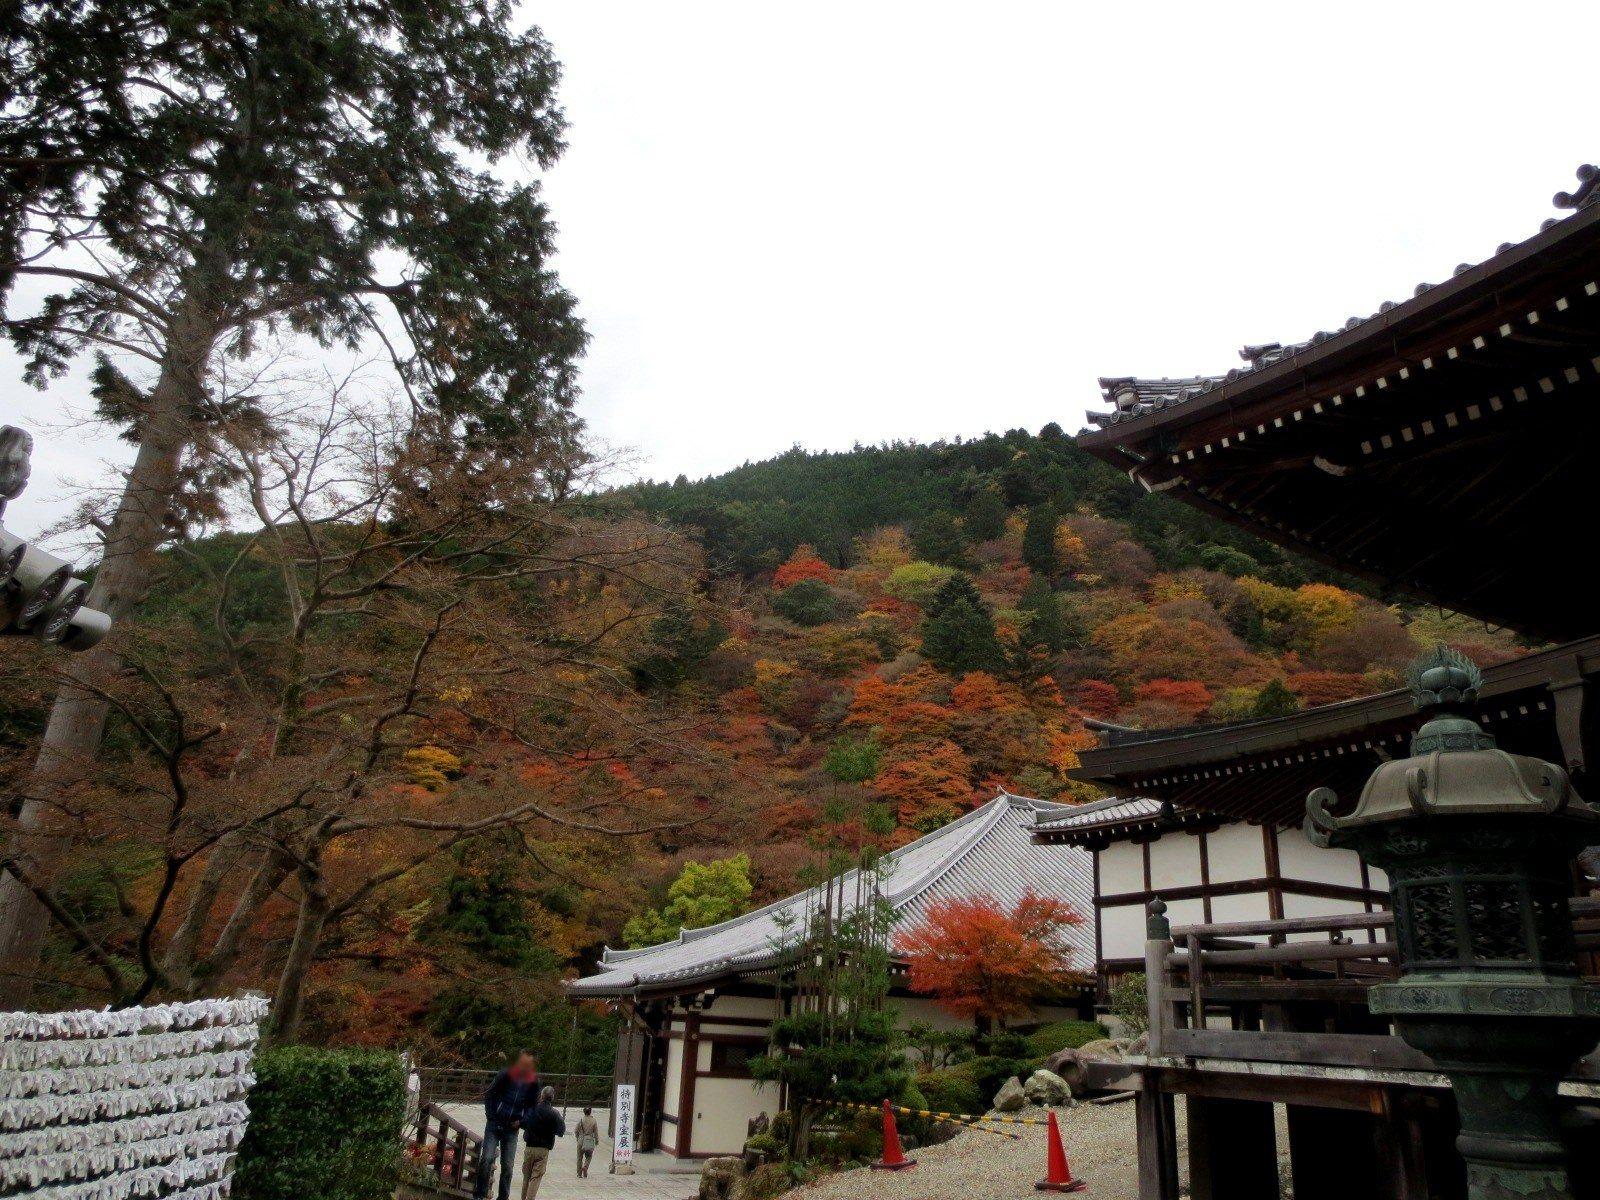 20th temple of the Saigoku Kannon pilgrimage